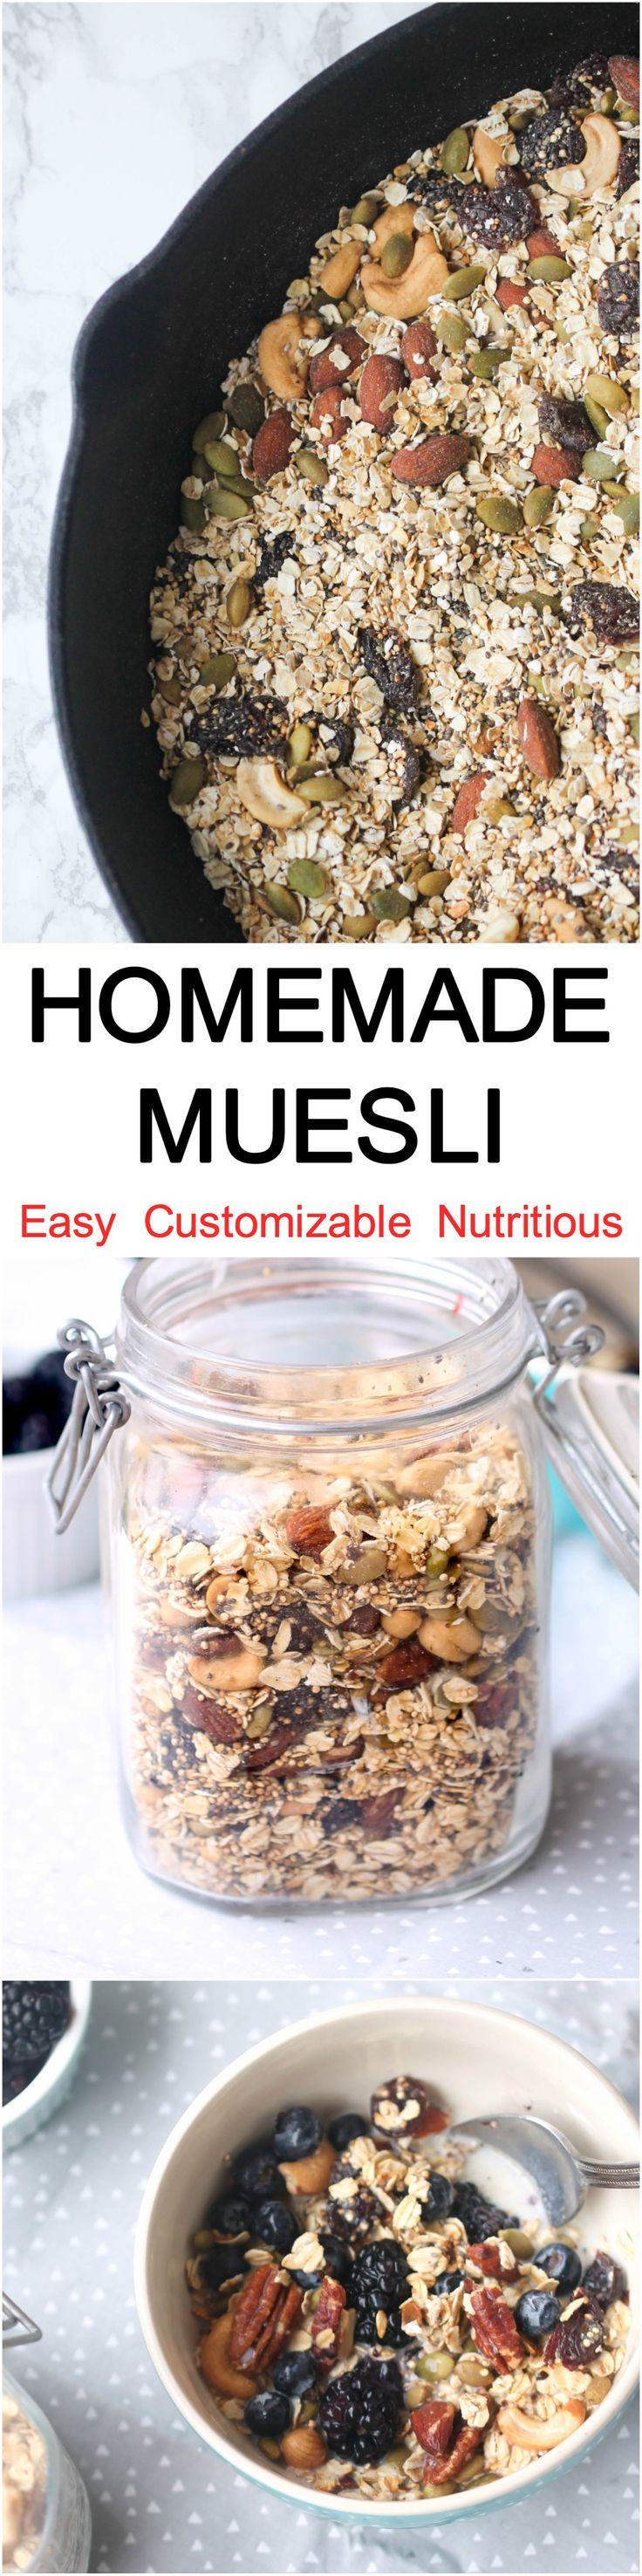 Homemade Muesli – quick, nutritious breakfast and snack option! Vegan and Gluten-Free.